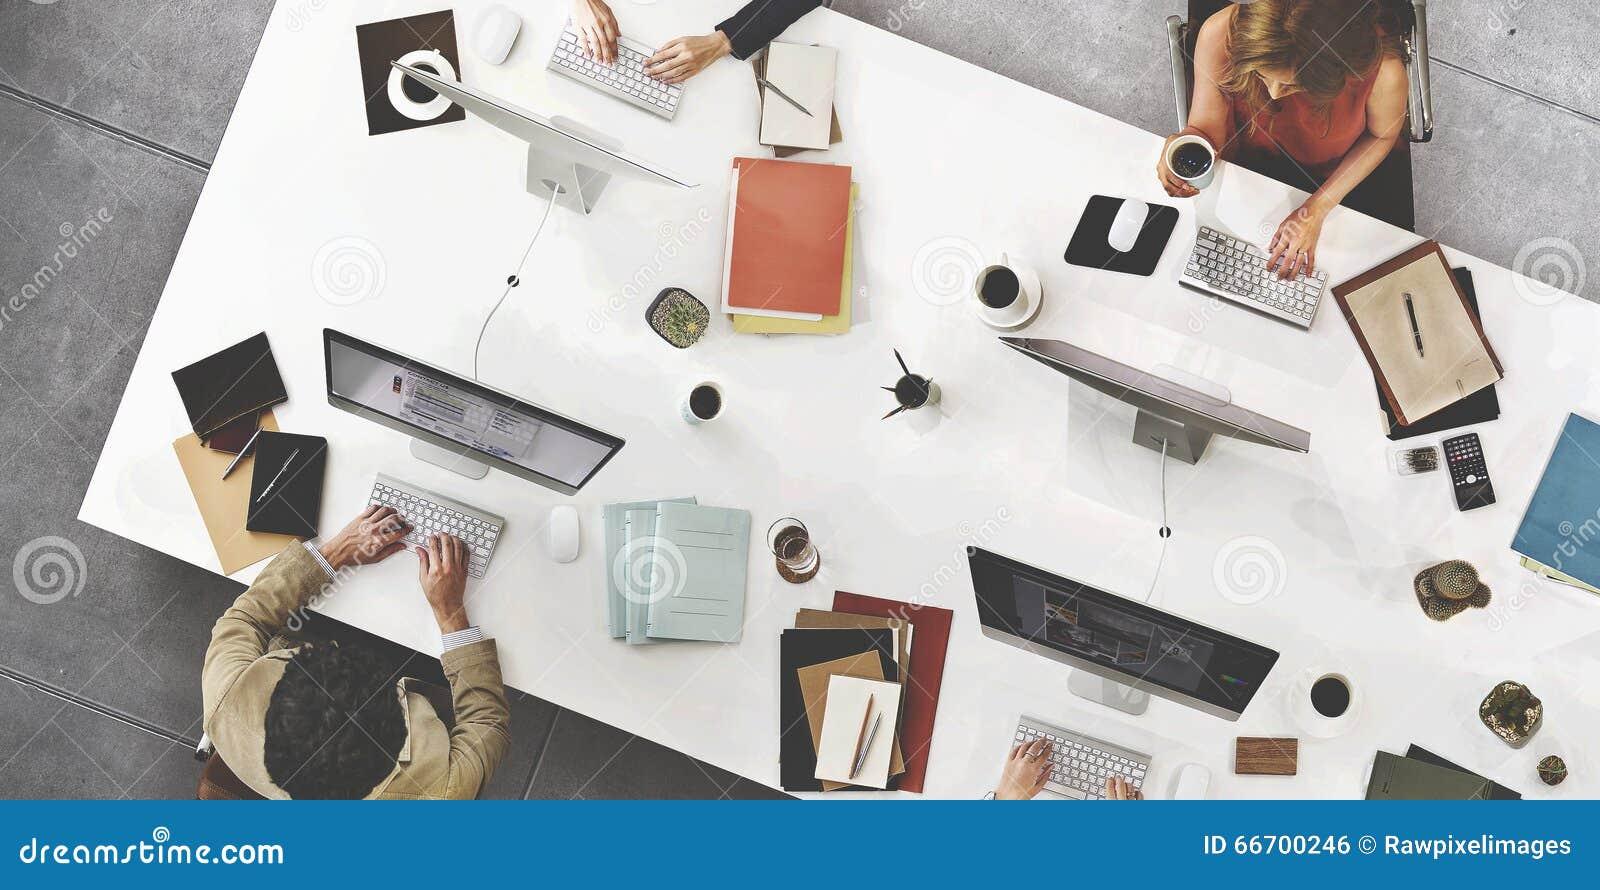 AffärsTeam Meeting Connection Digital Technology begrepp